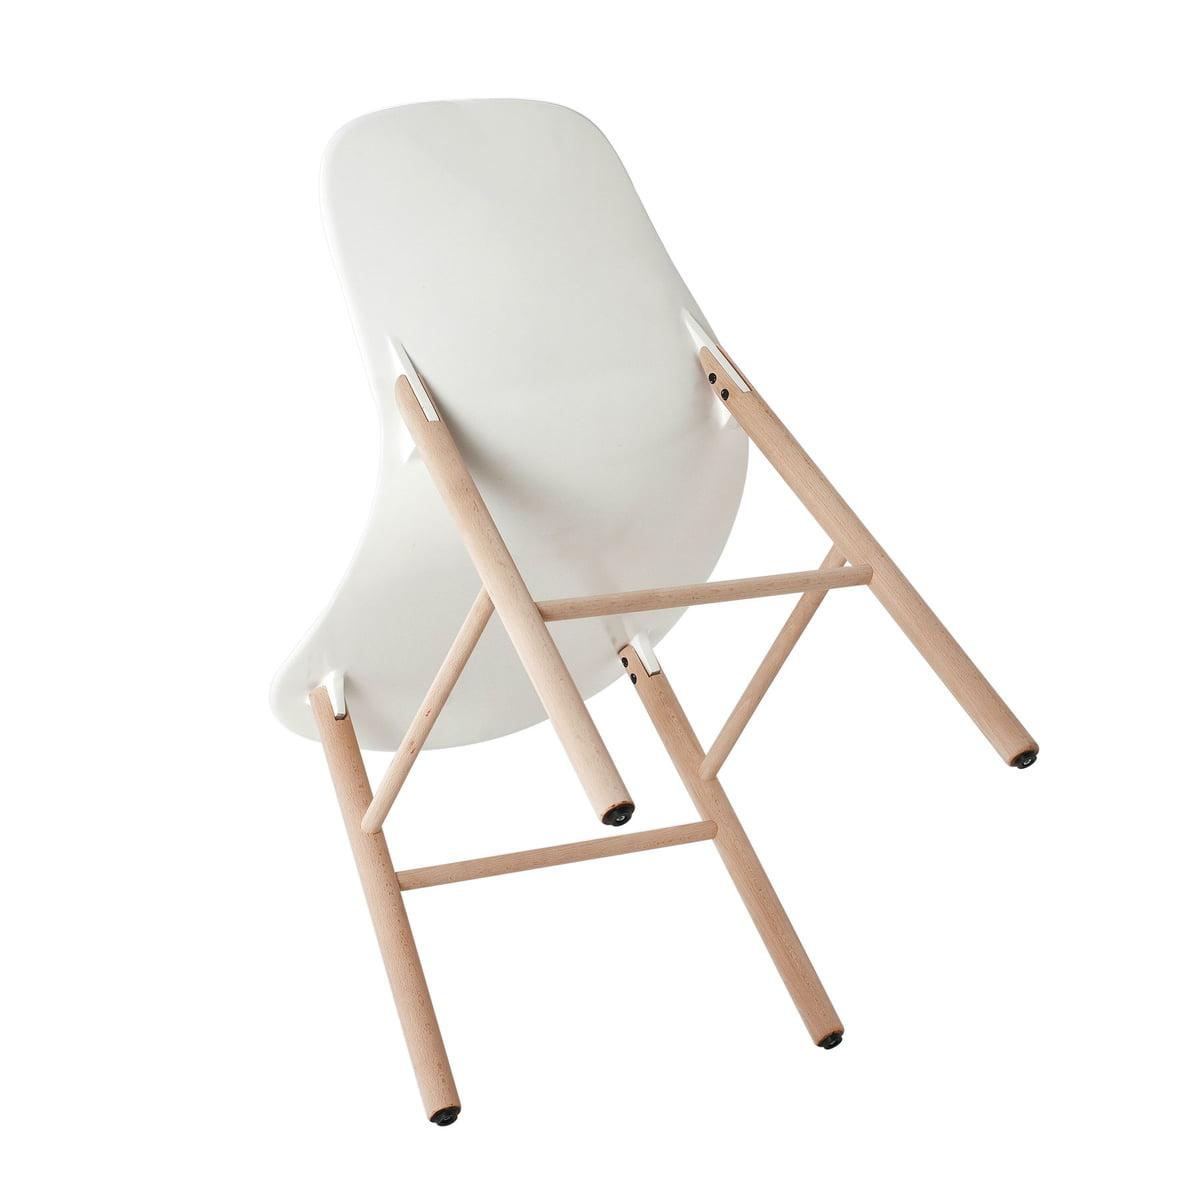 sharky stuhl von kristalia connox. Black Bedroom Furniture Sets. Home Design Ideas